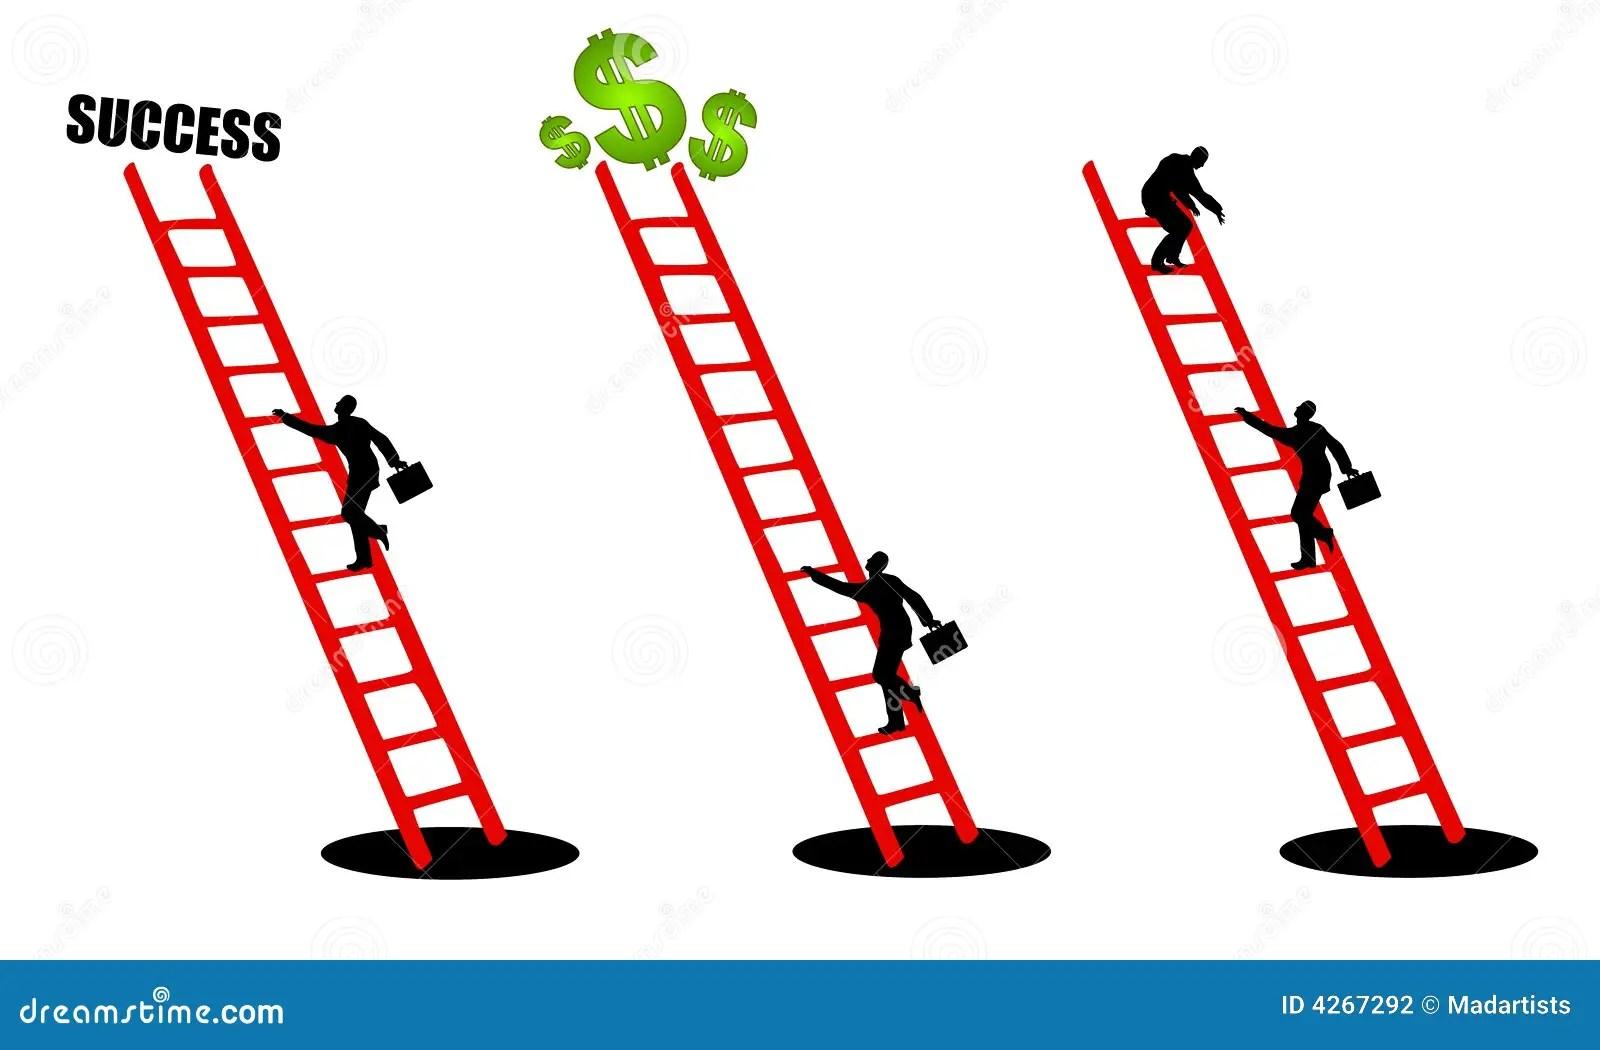 Climbing The Ladder Of Success 2 Stock Illustration